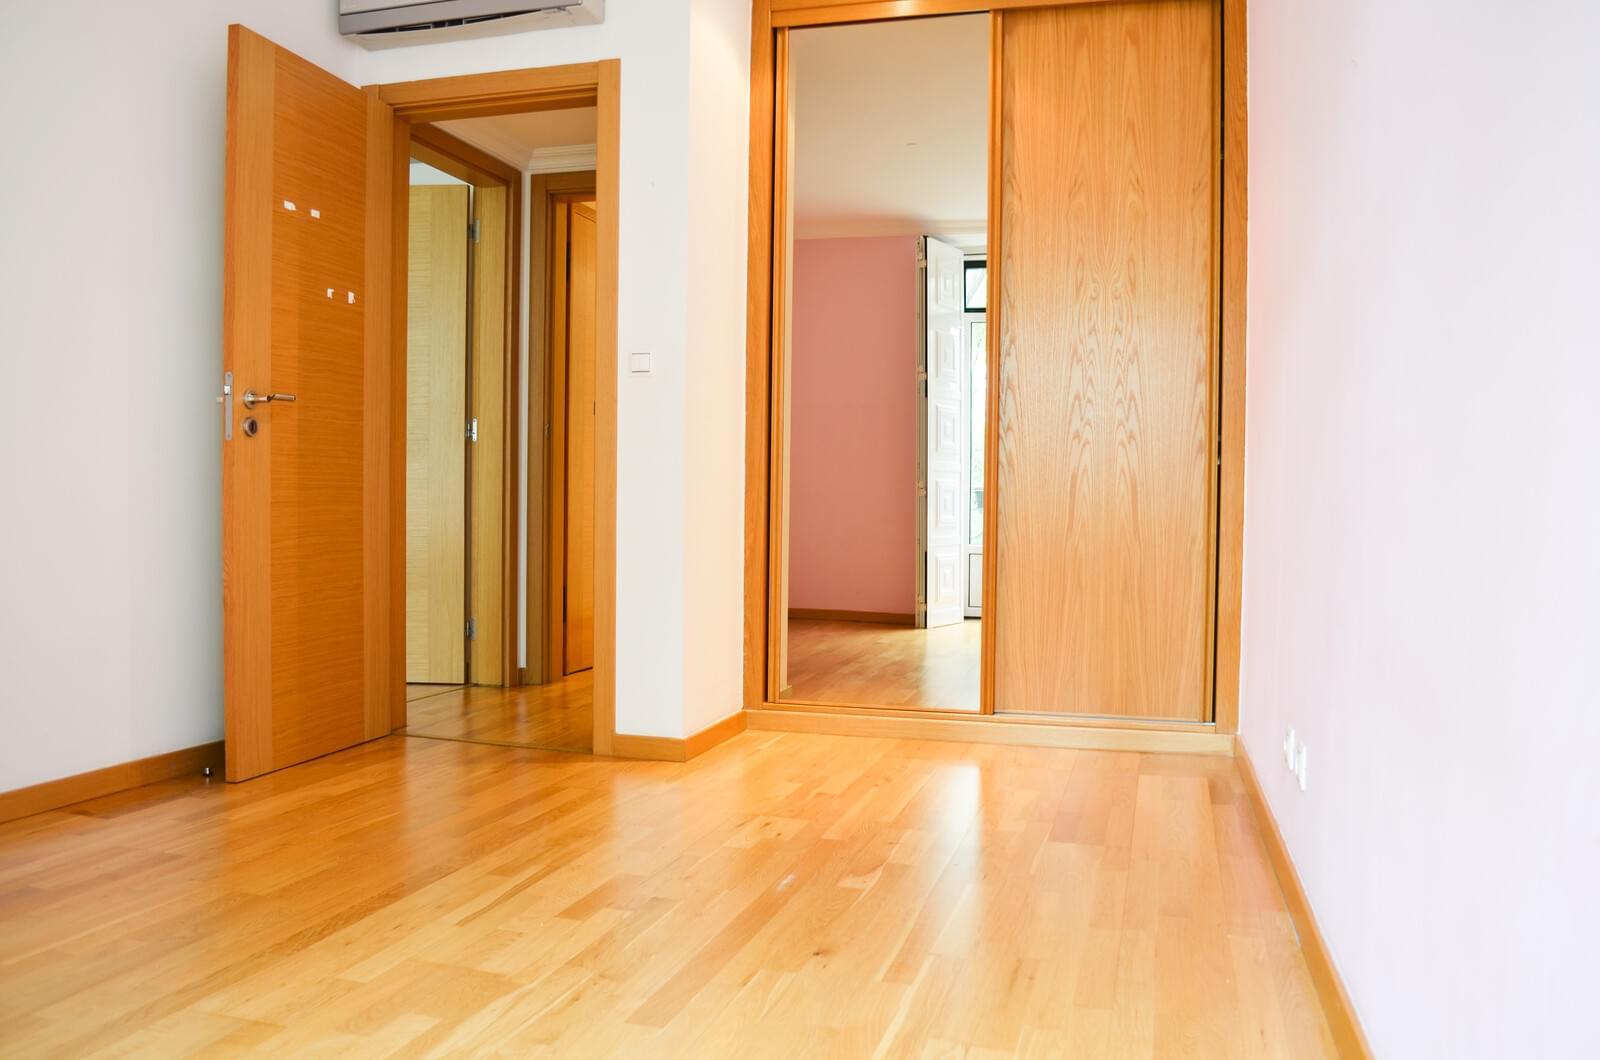 pf18839-apartamento-t2-lisboa-43db1304-6720-4f50-8258-0369ce5d6c3b